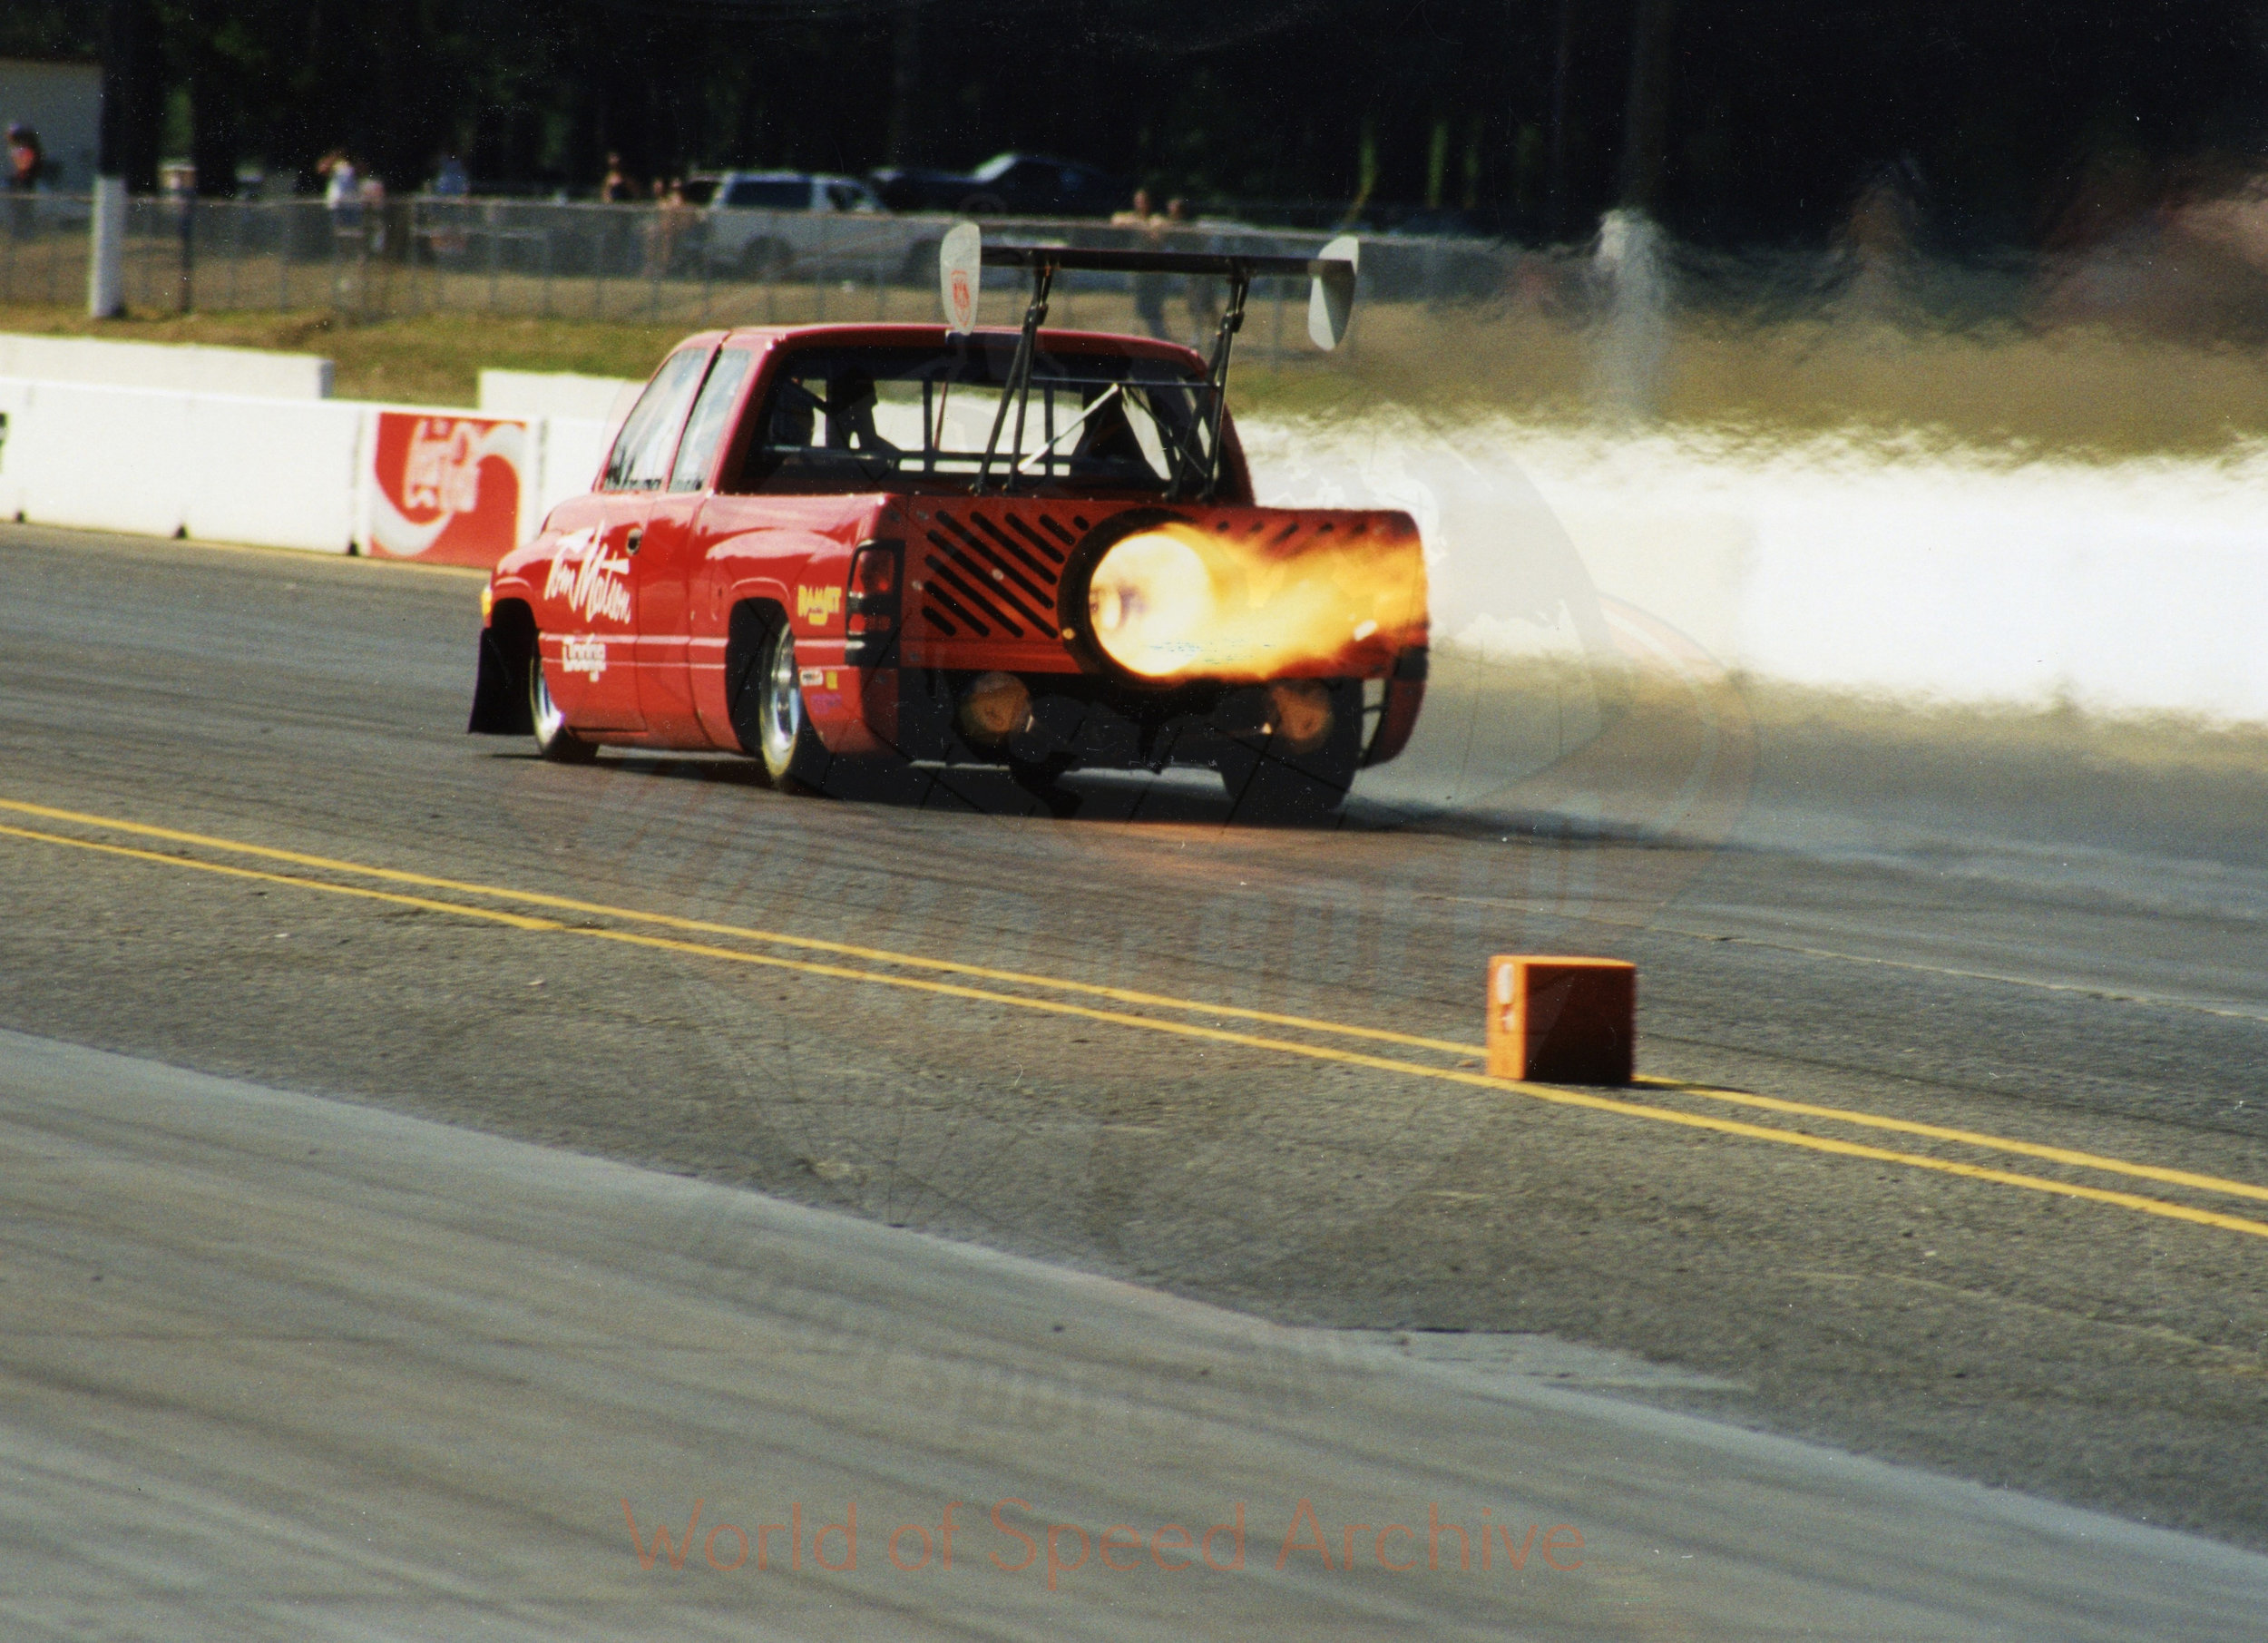 B5-S3-G1-F29-002 - drag truck back burn